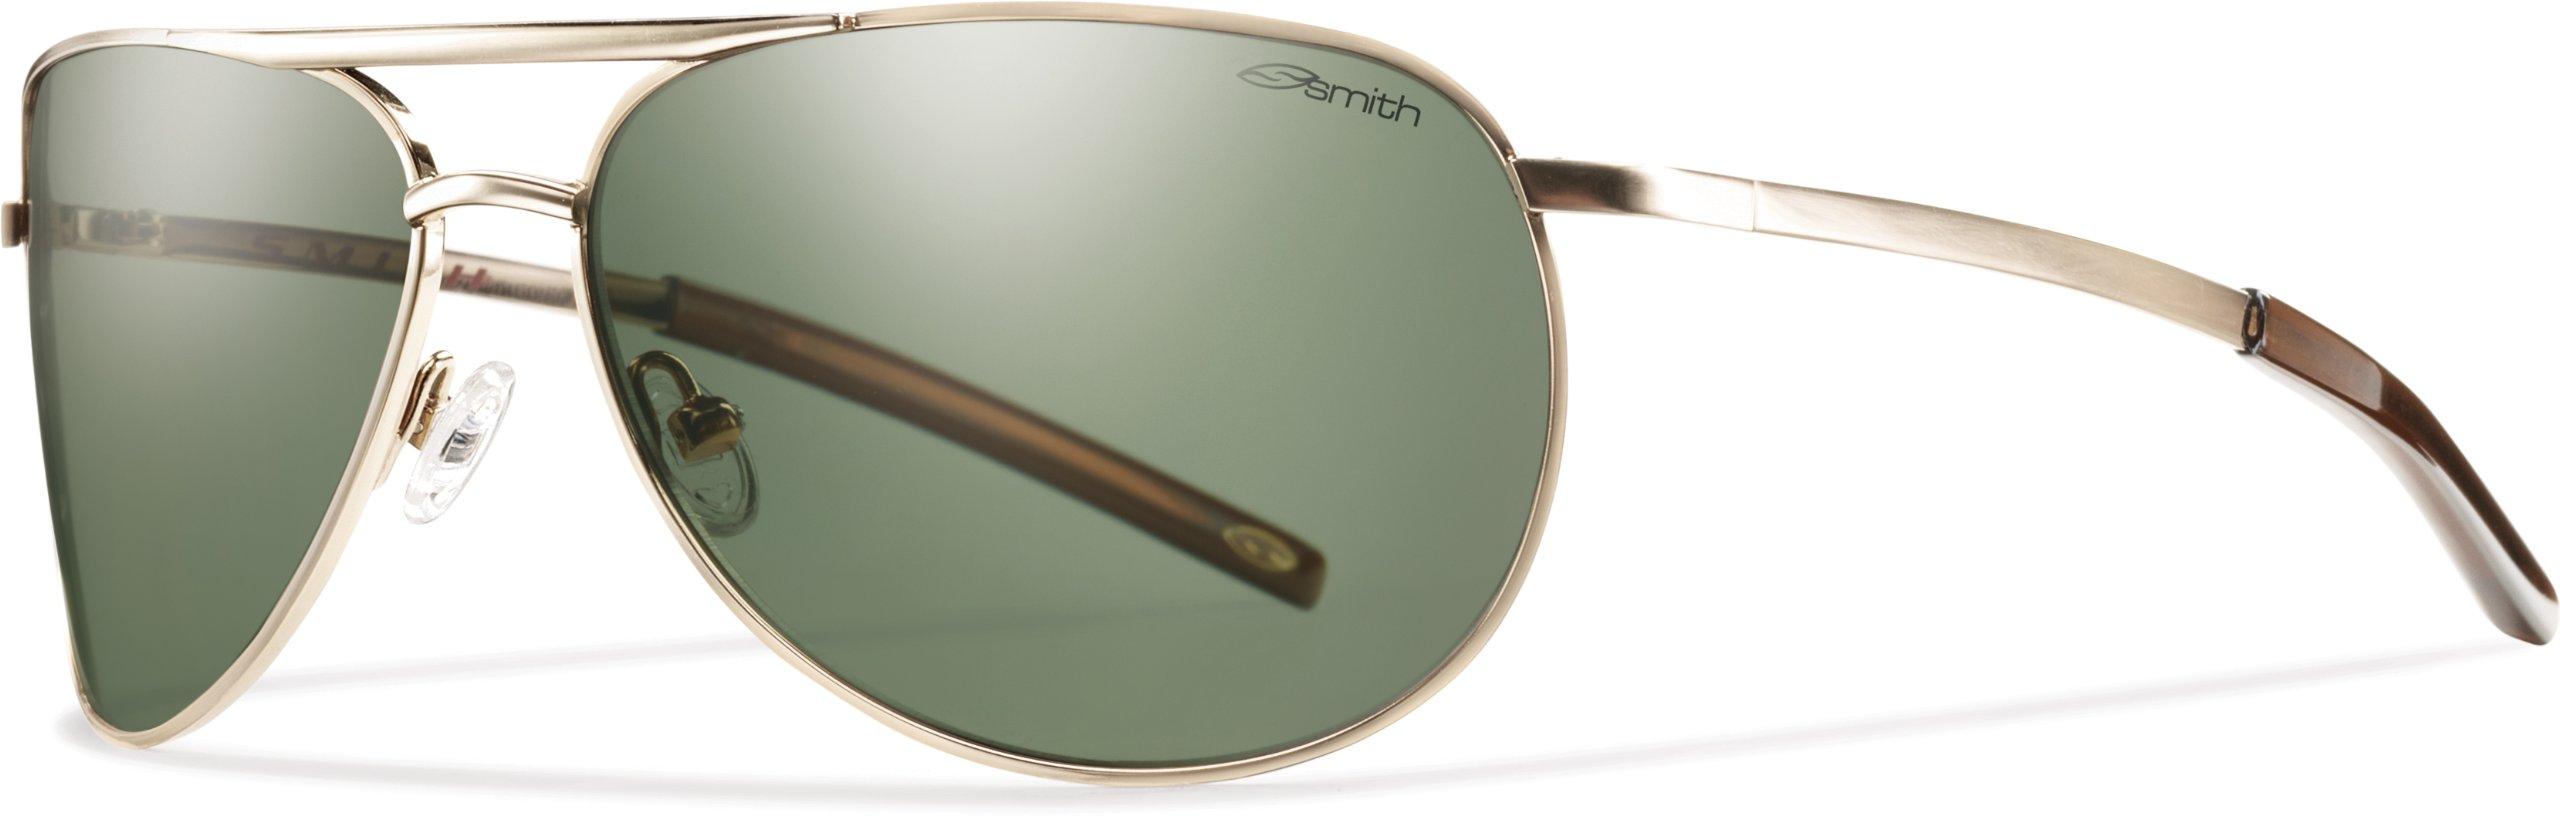 Smith Optics Serpico Slim Sunglass, Gold / Gray Green Polarized Polycarbonate